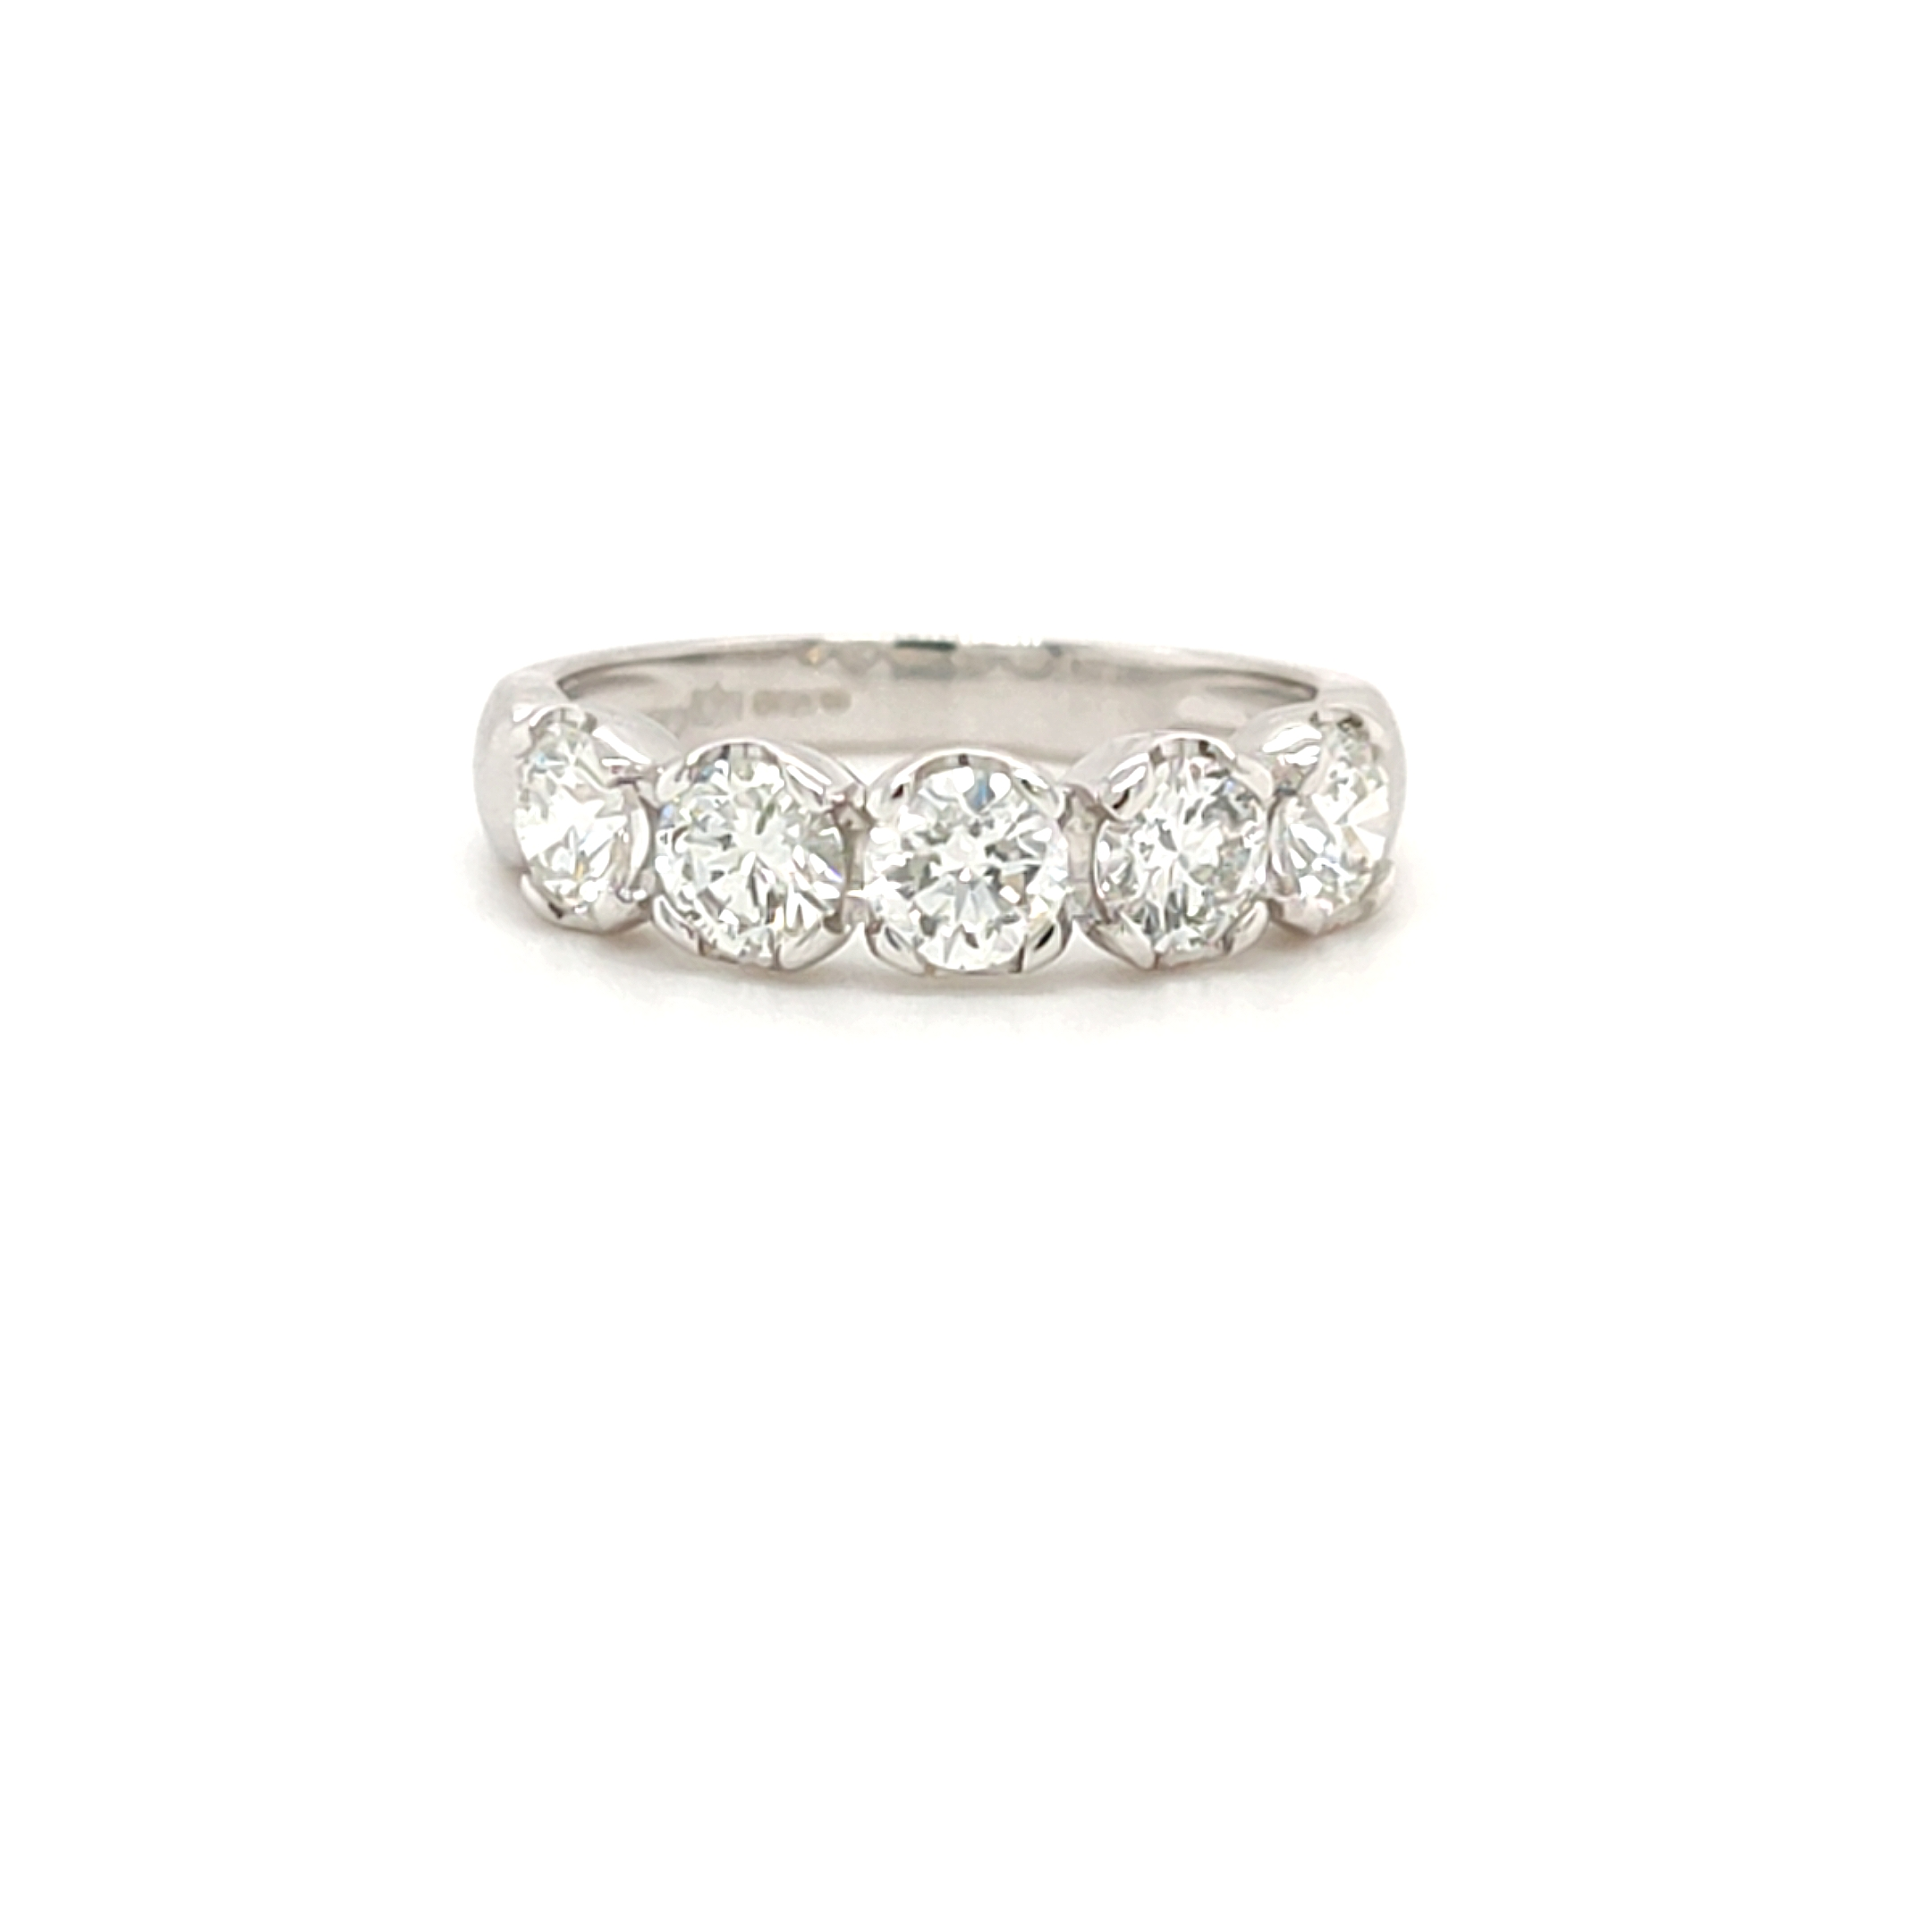 1.45ct Brilliant Cut Diamond Ring